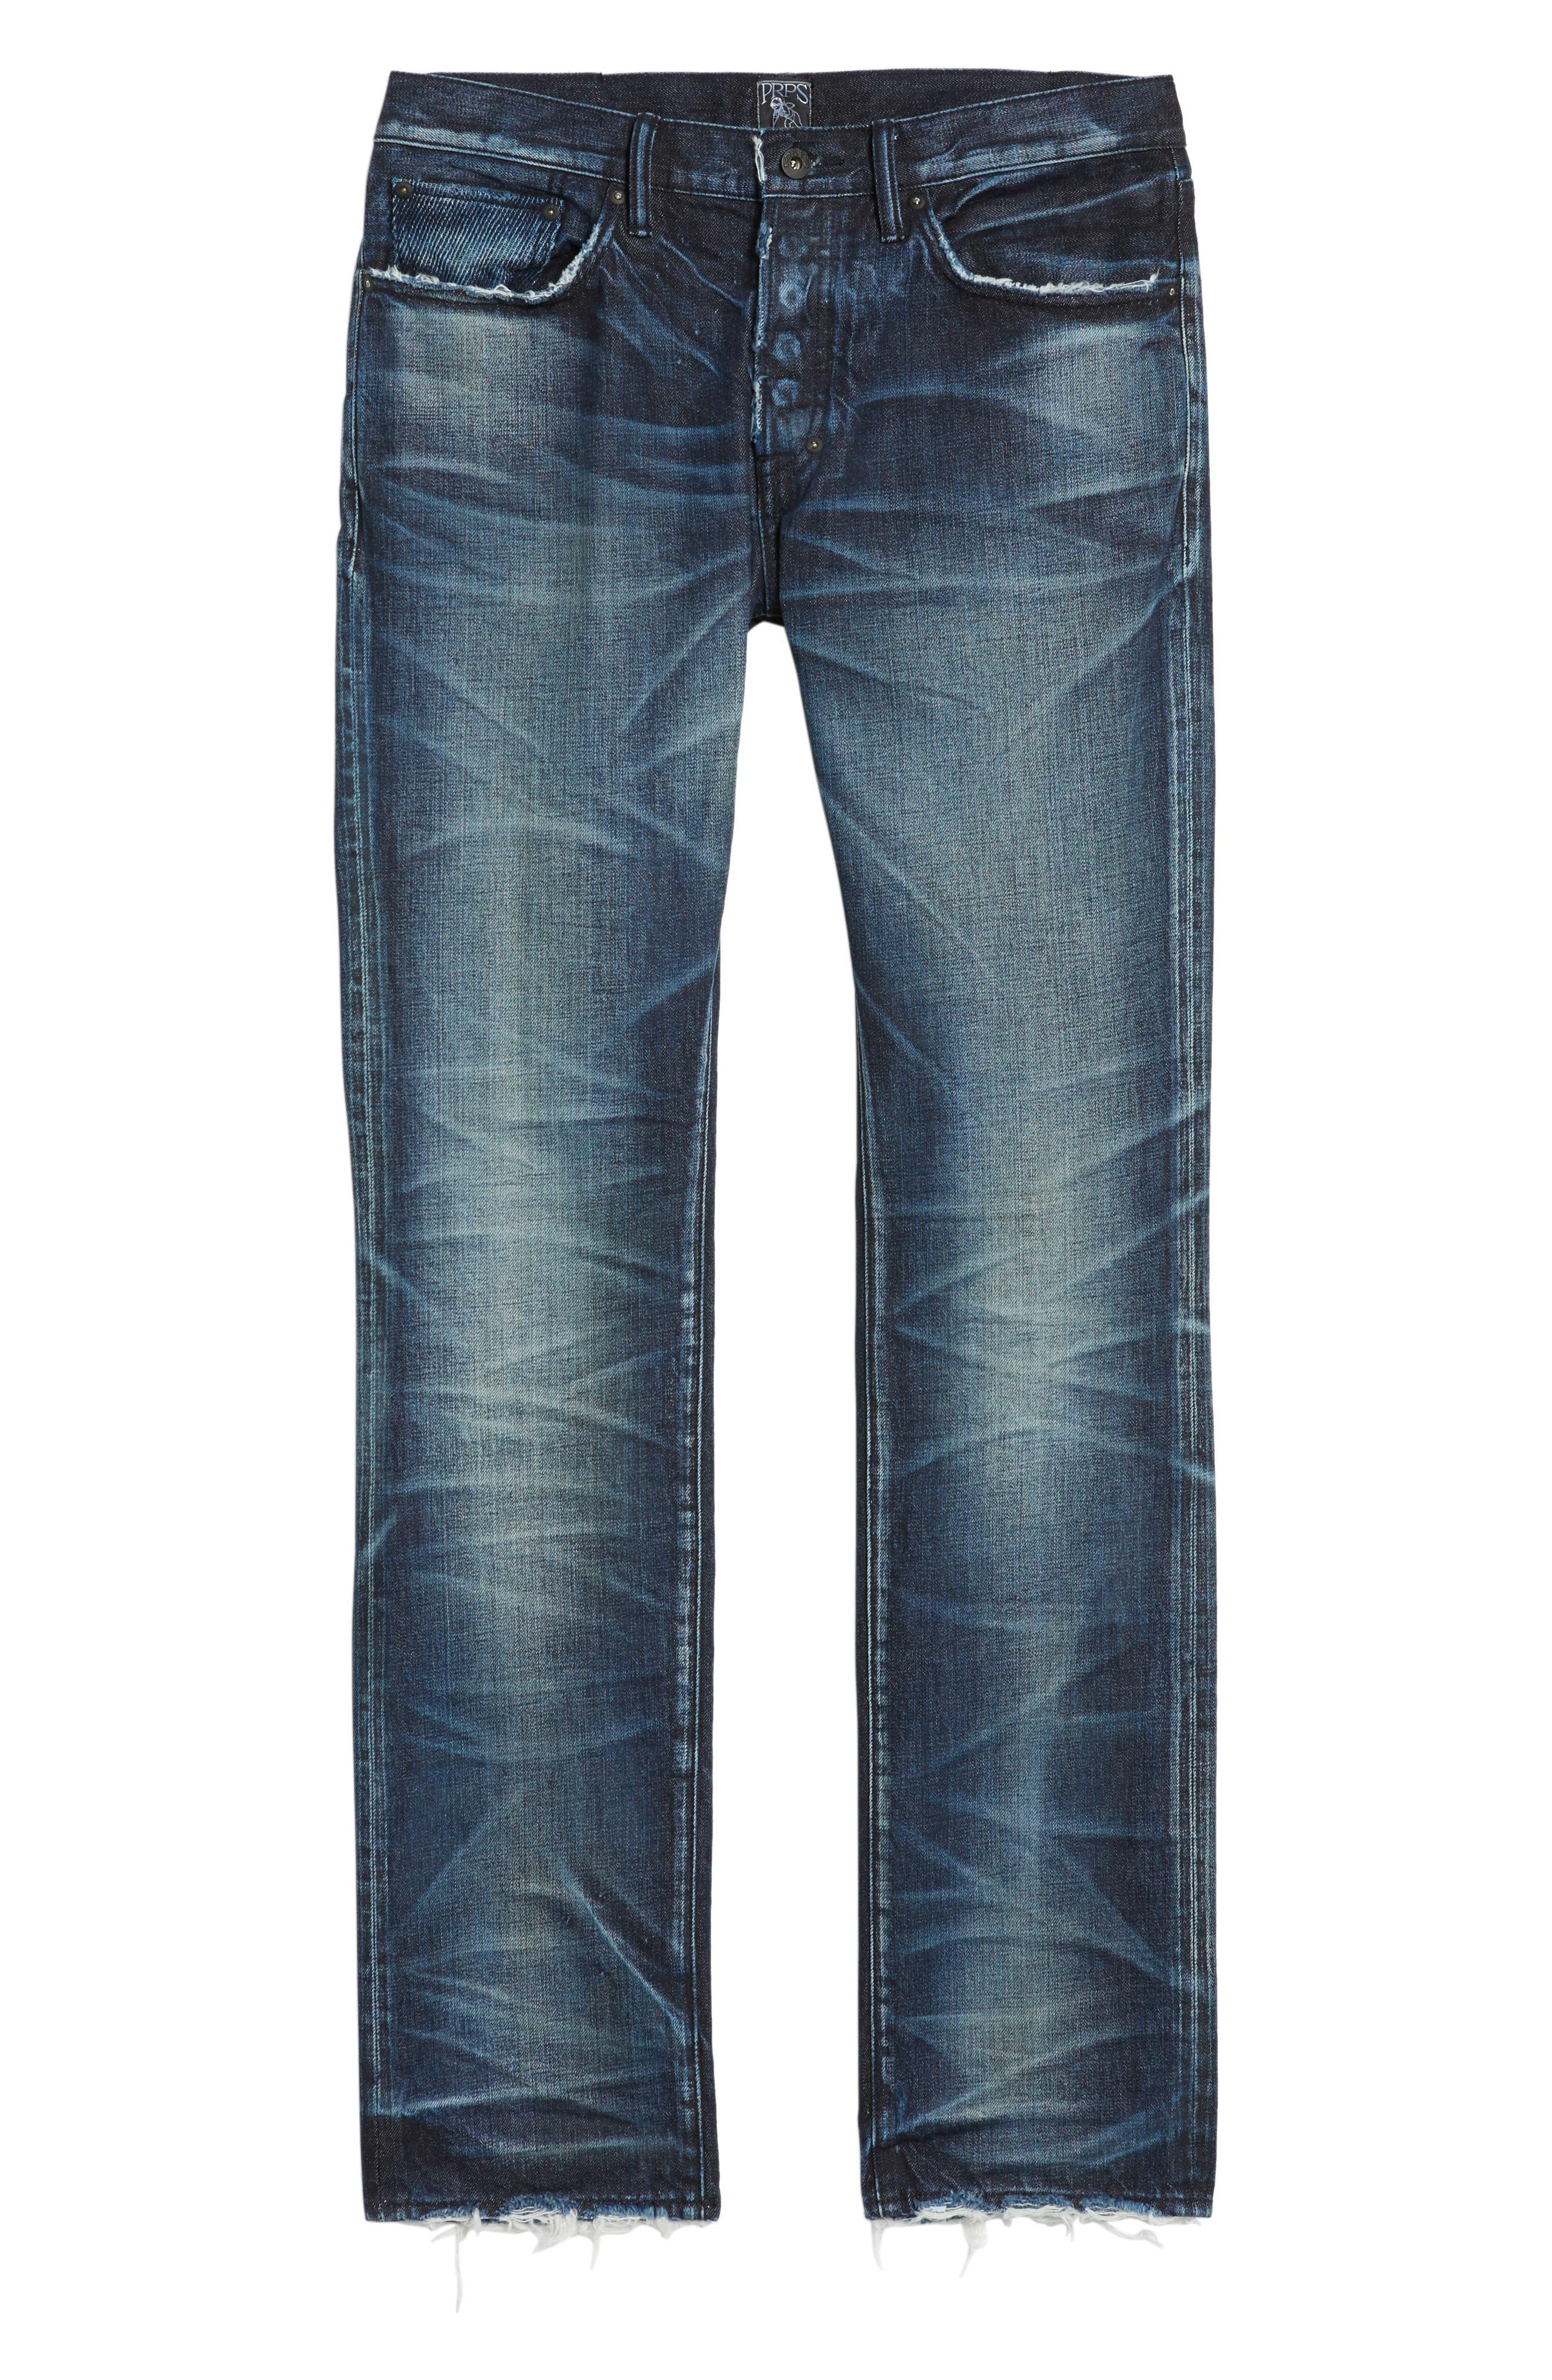 Demon Slim Straight Jeans,                             Alternate thumbnail 6, color,                             INDIGO